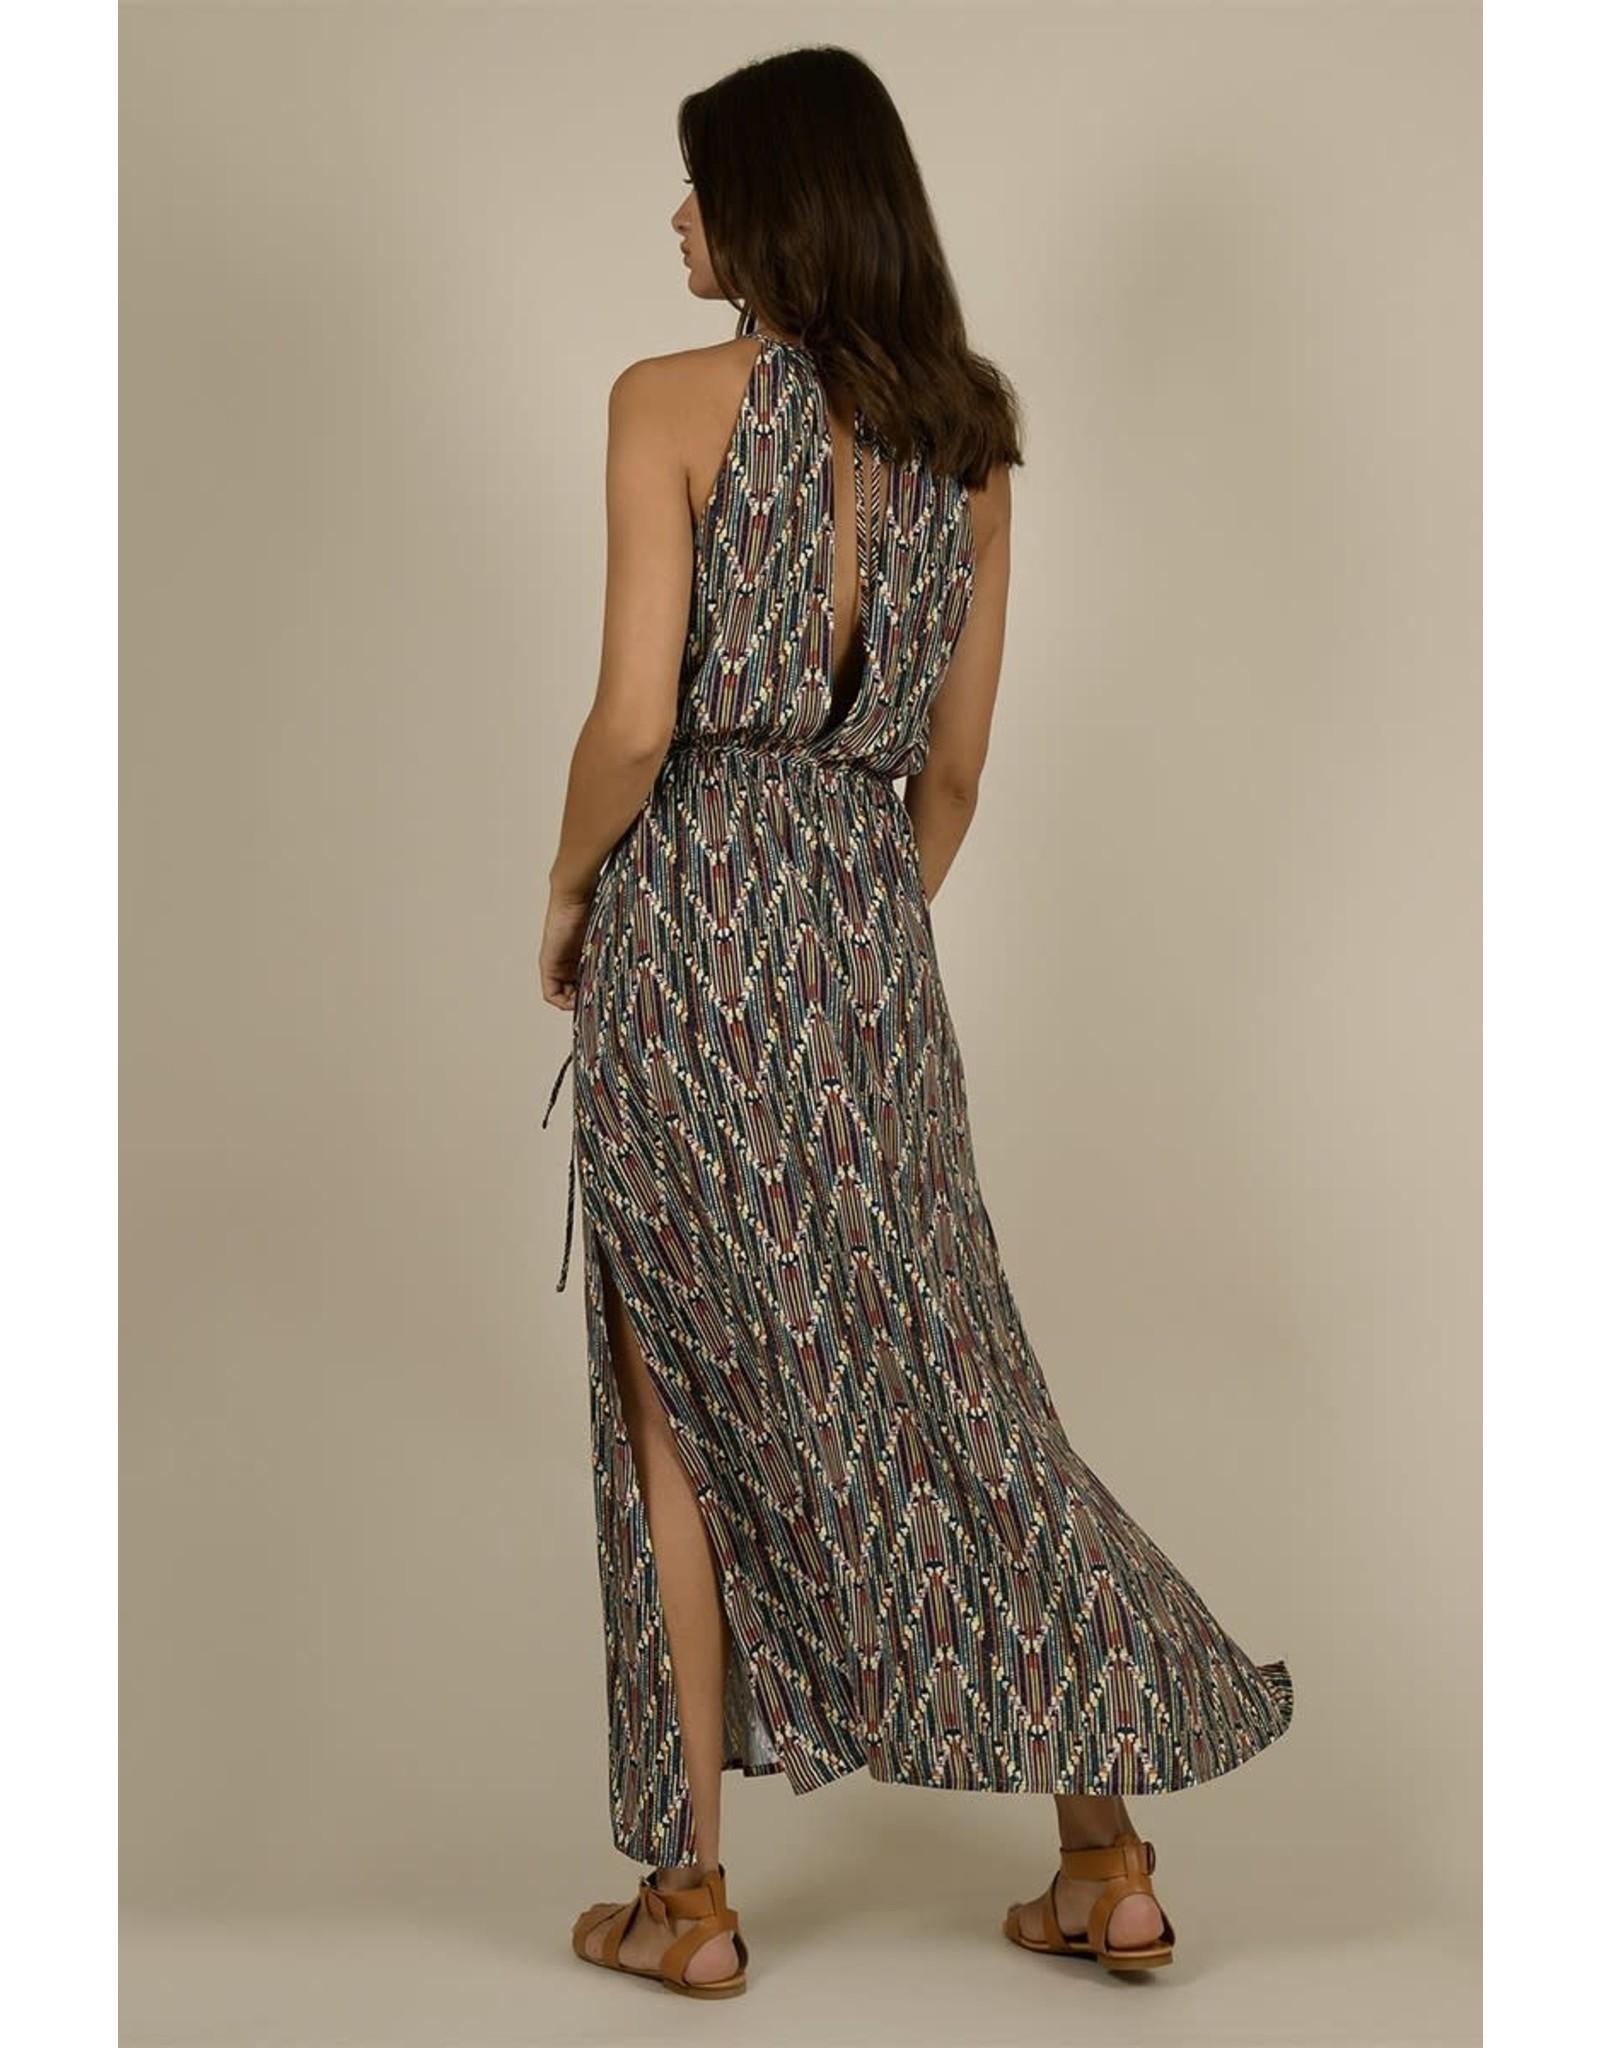 Molly Bracken, Maxi Printed Dress, Beige